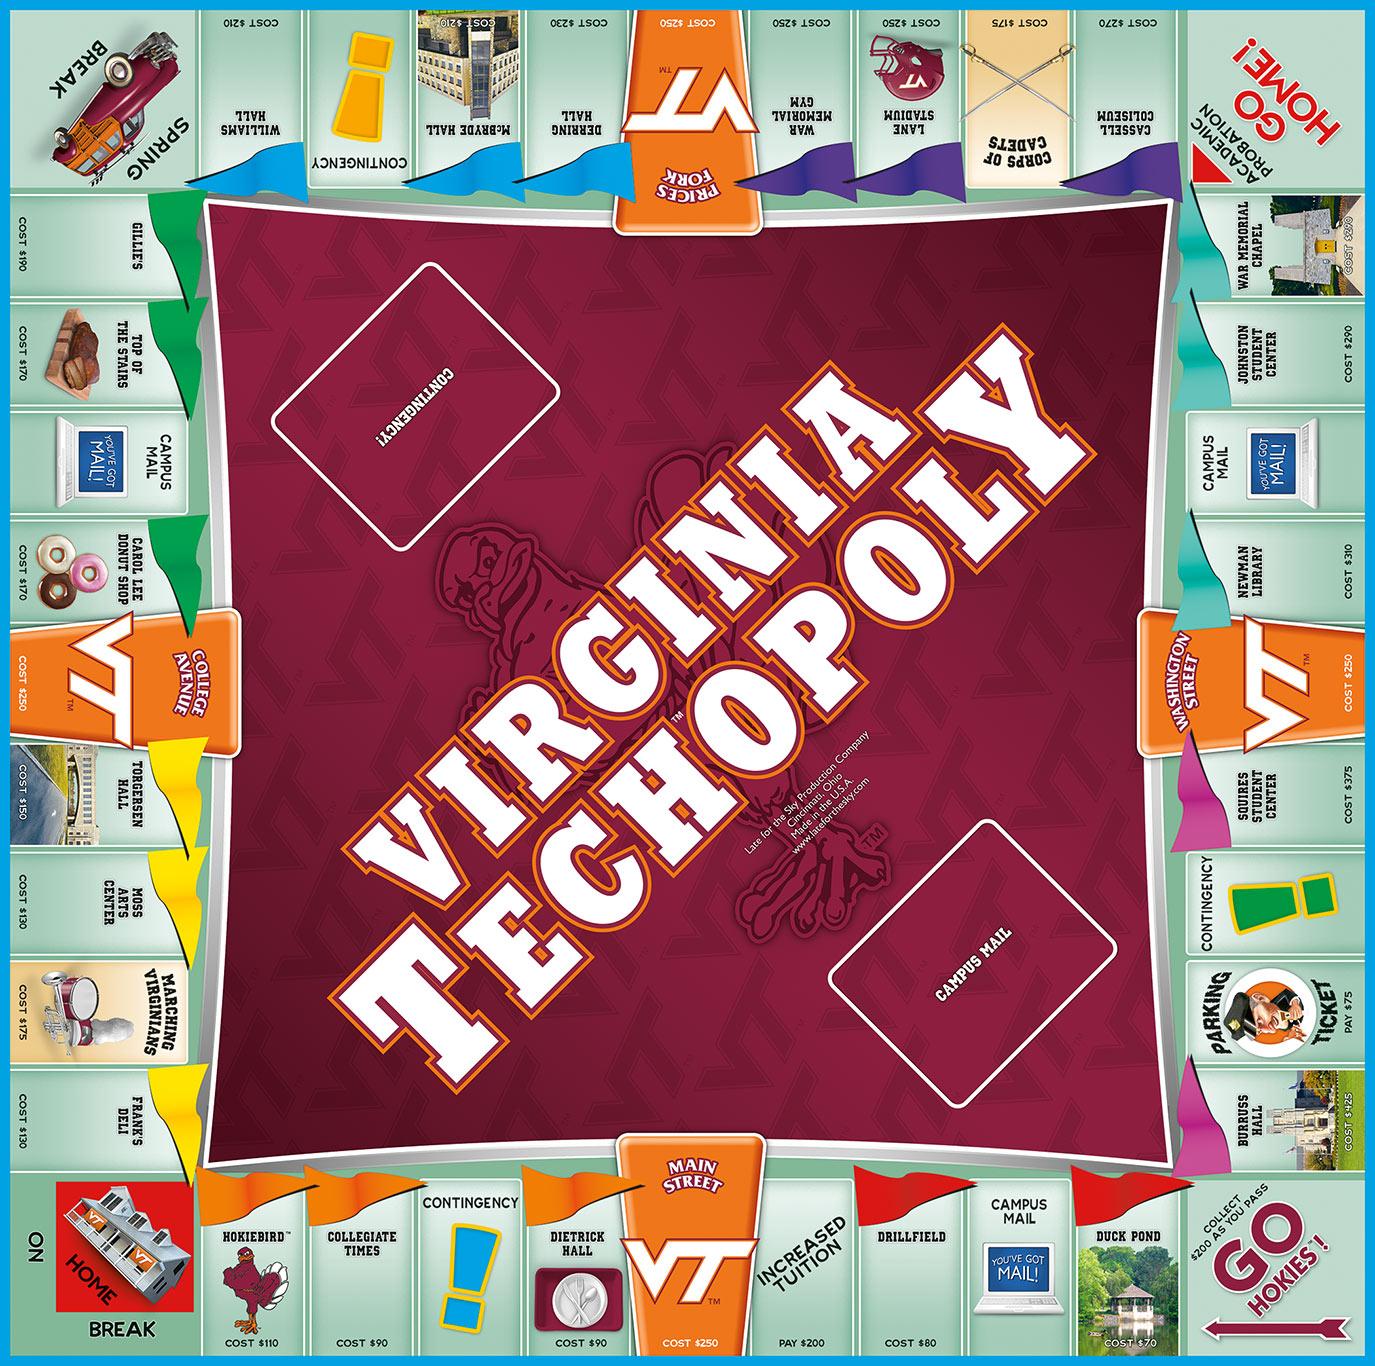 VA.TECHOPOLY Board Game